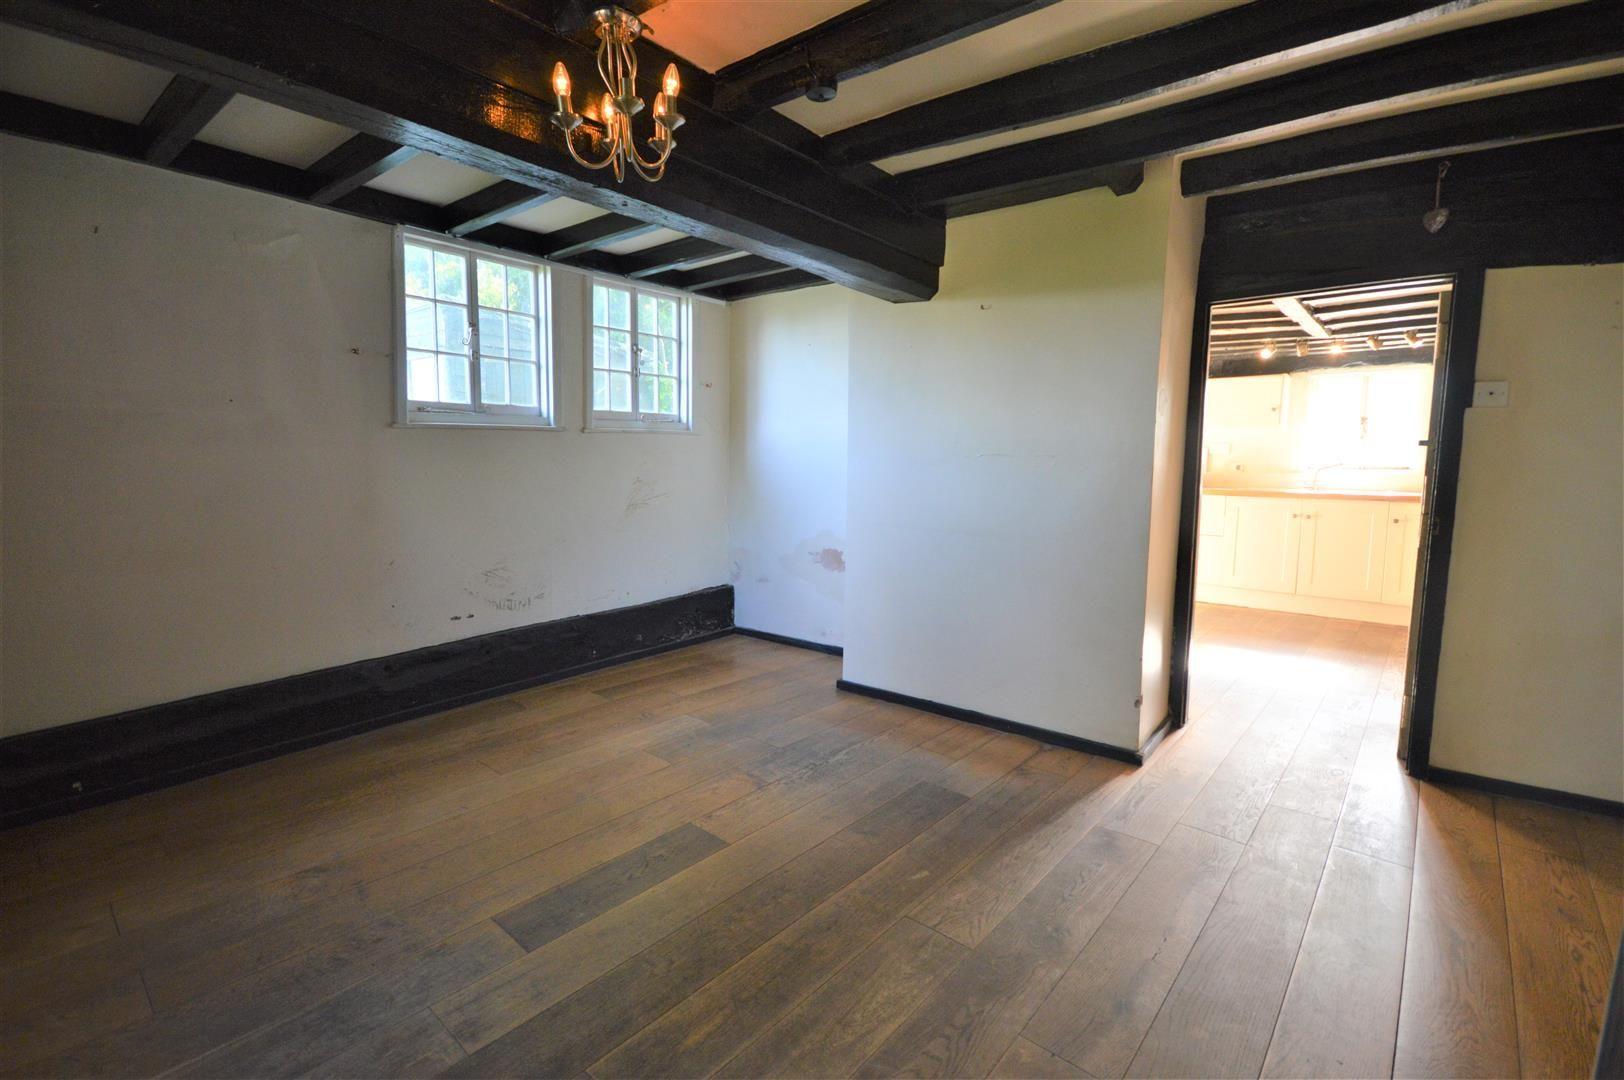 3 bed cottage for sale in Pembridge  - Property Image 3